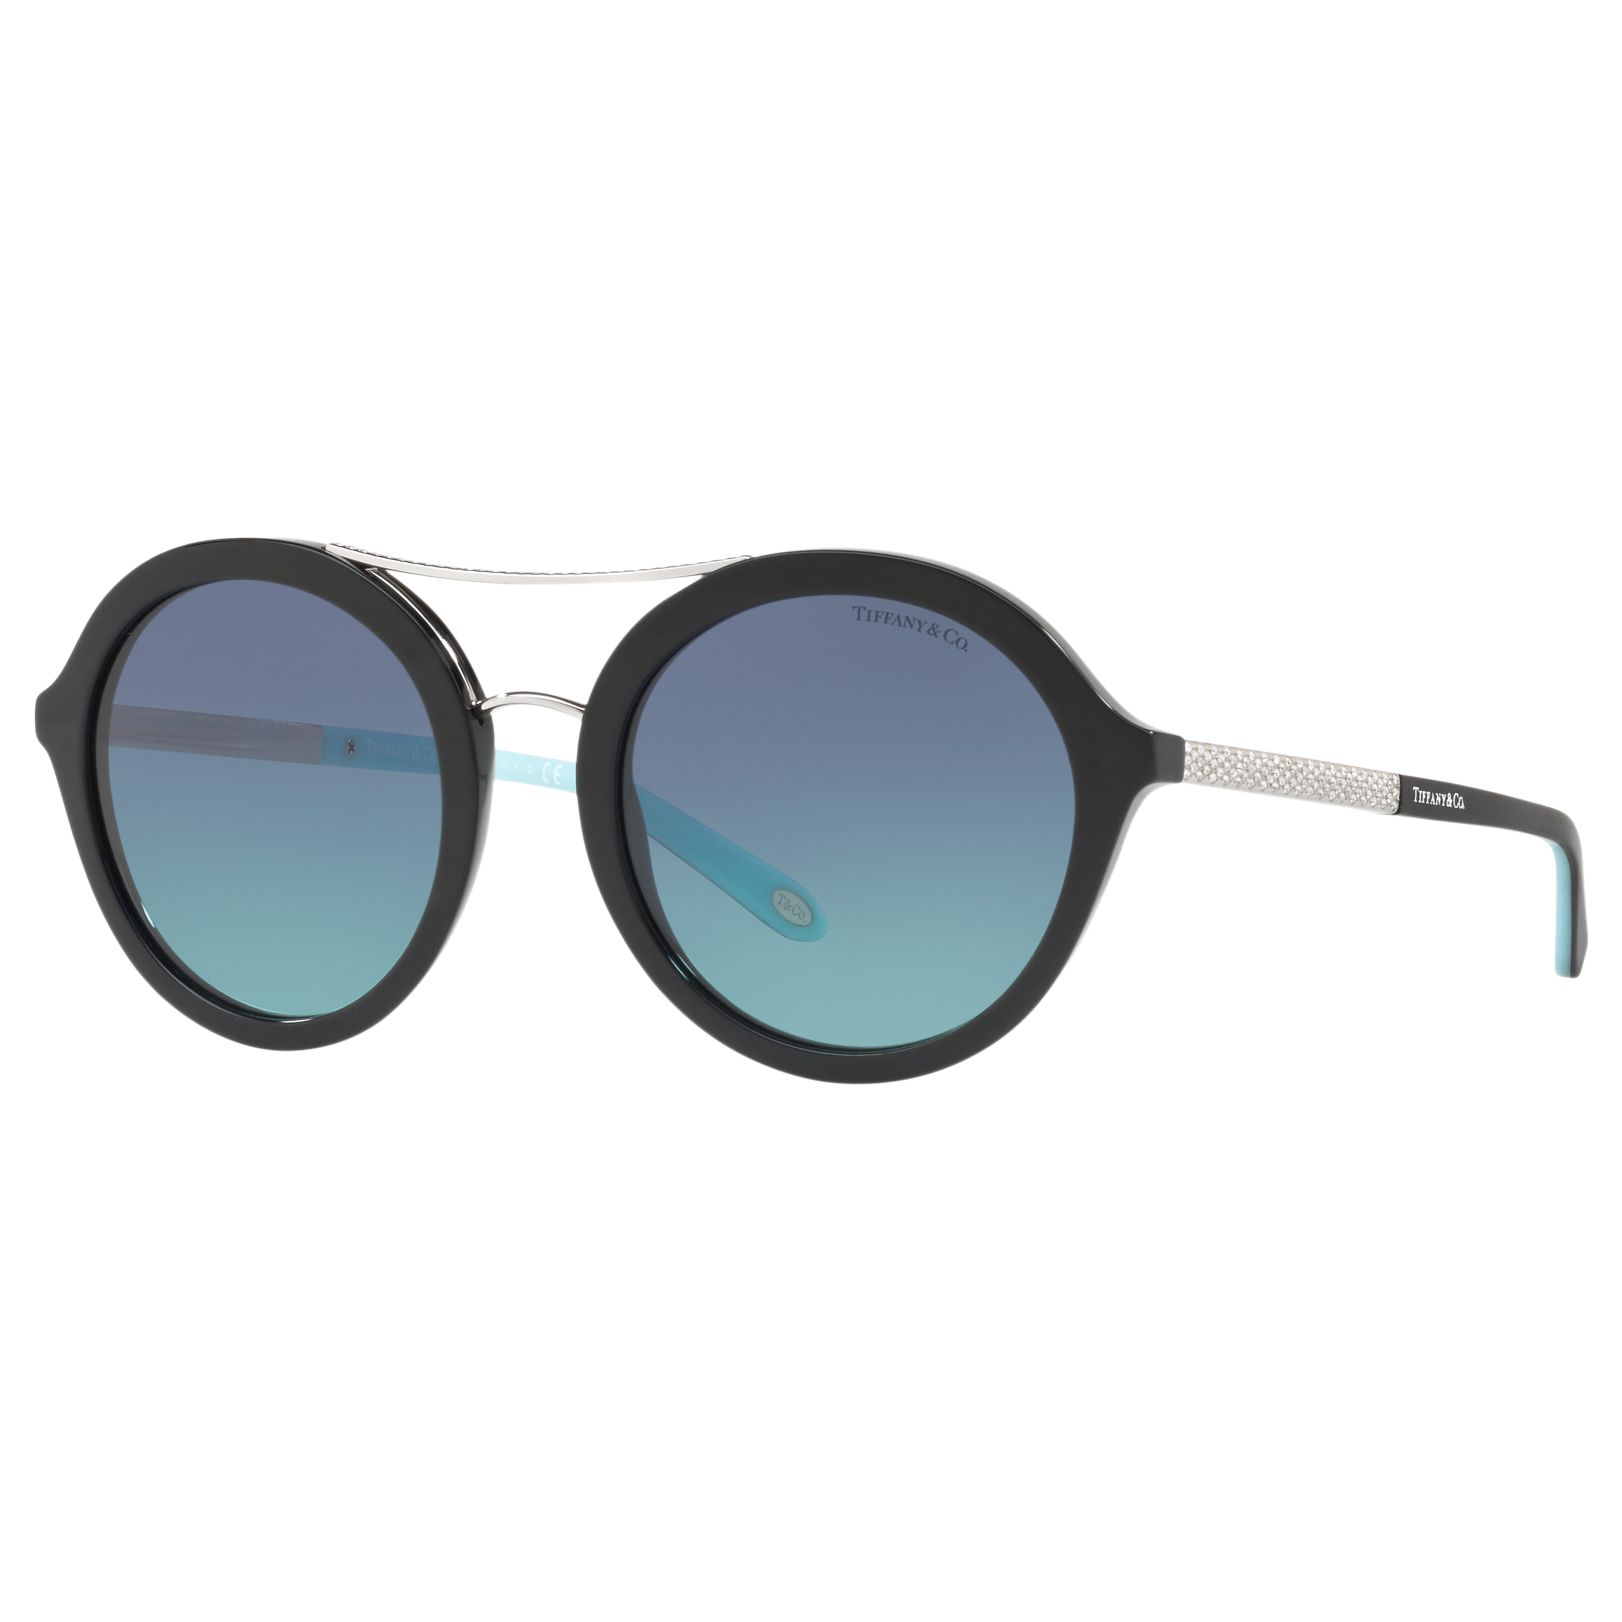 Eyeglass Frames Jacksonville Fl : ray ban sunglasses shot extreme matte black